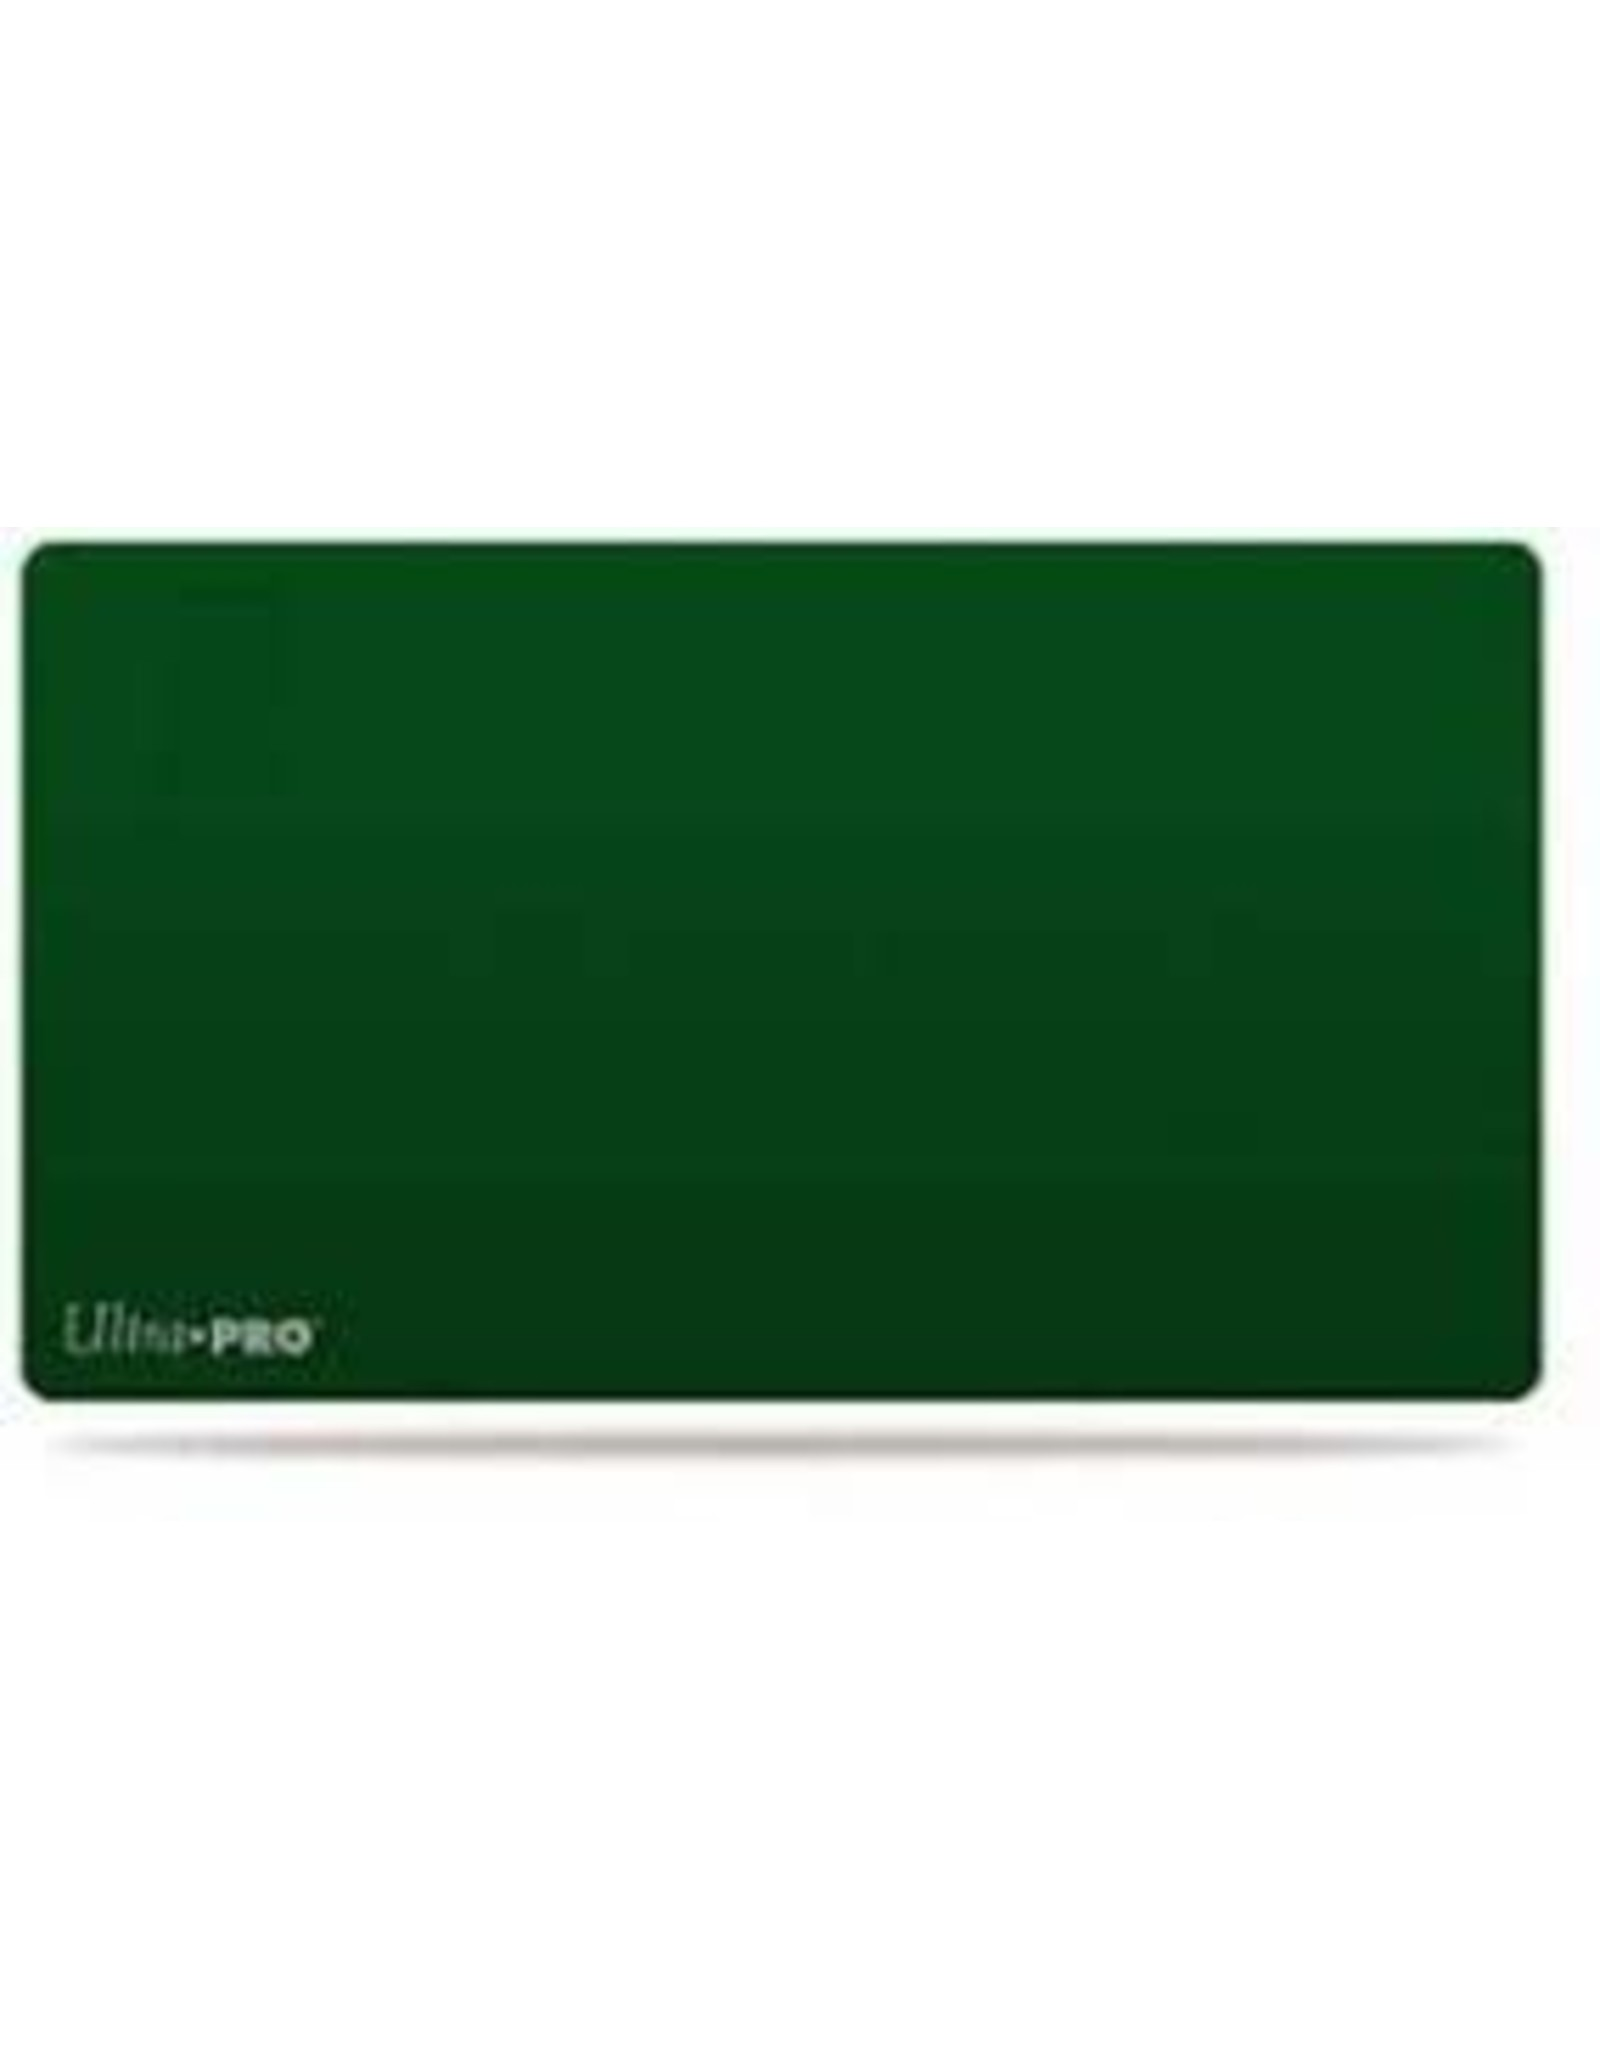 Ultra Pro Ultra Pro Artist Gallery: Green Playmat